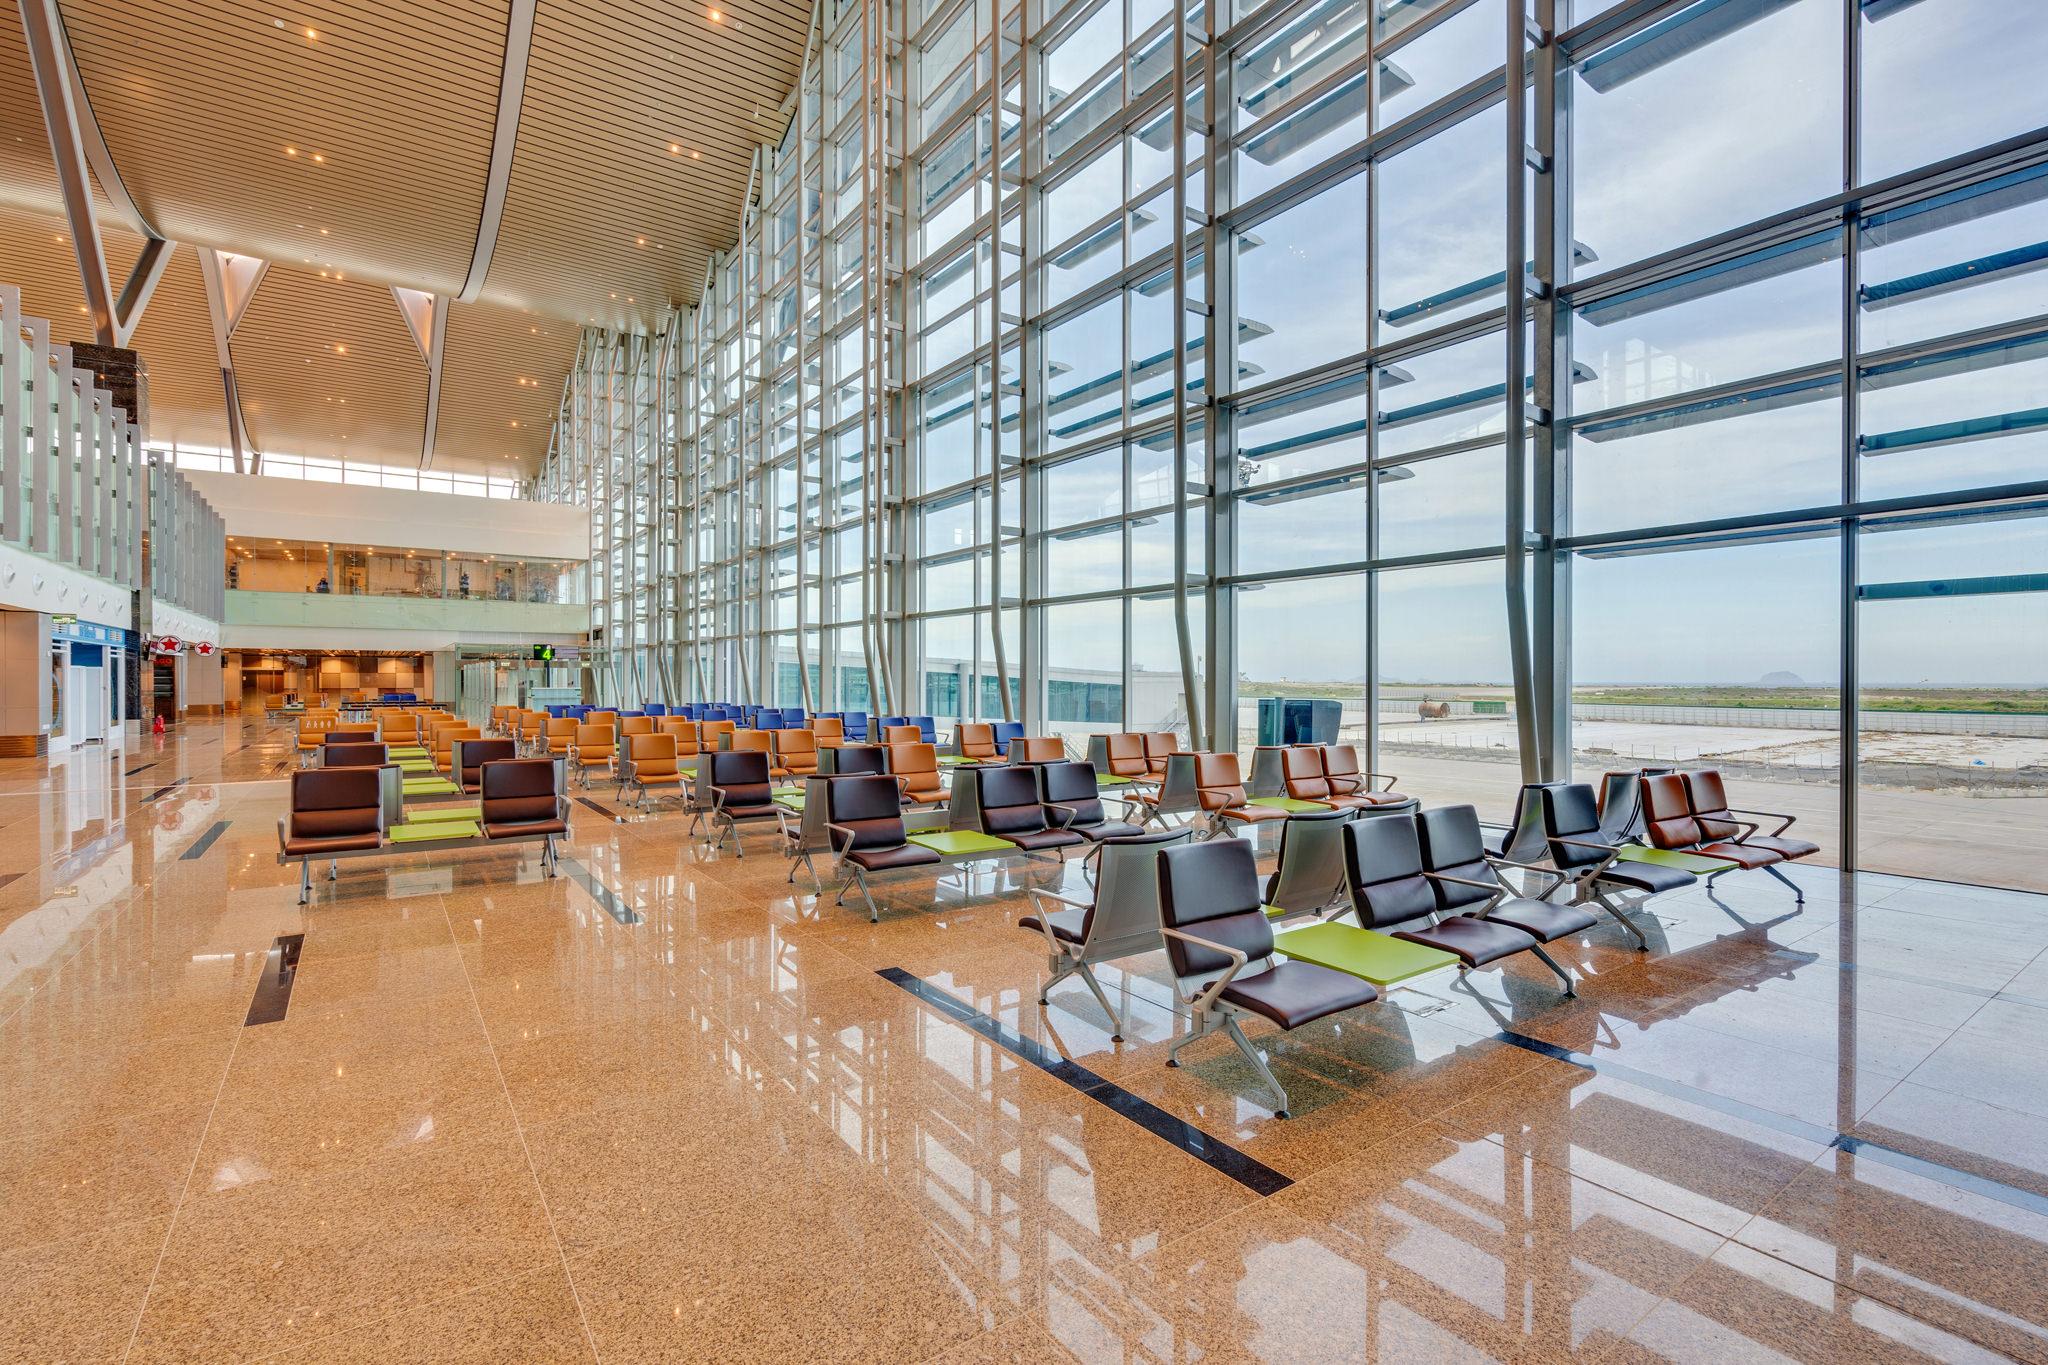 20180626 - Cam Ranh Airport - Architecture - 0355.jpg